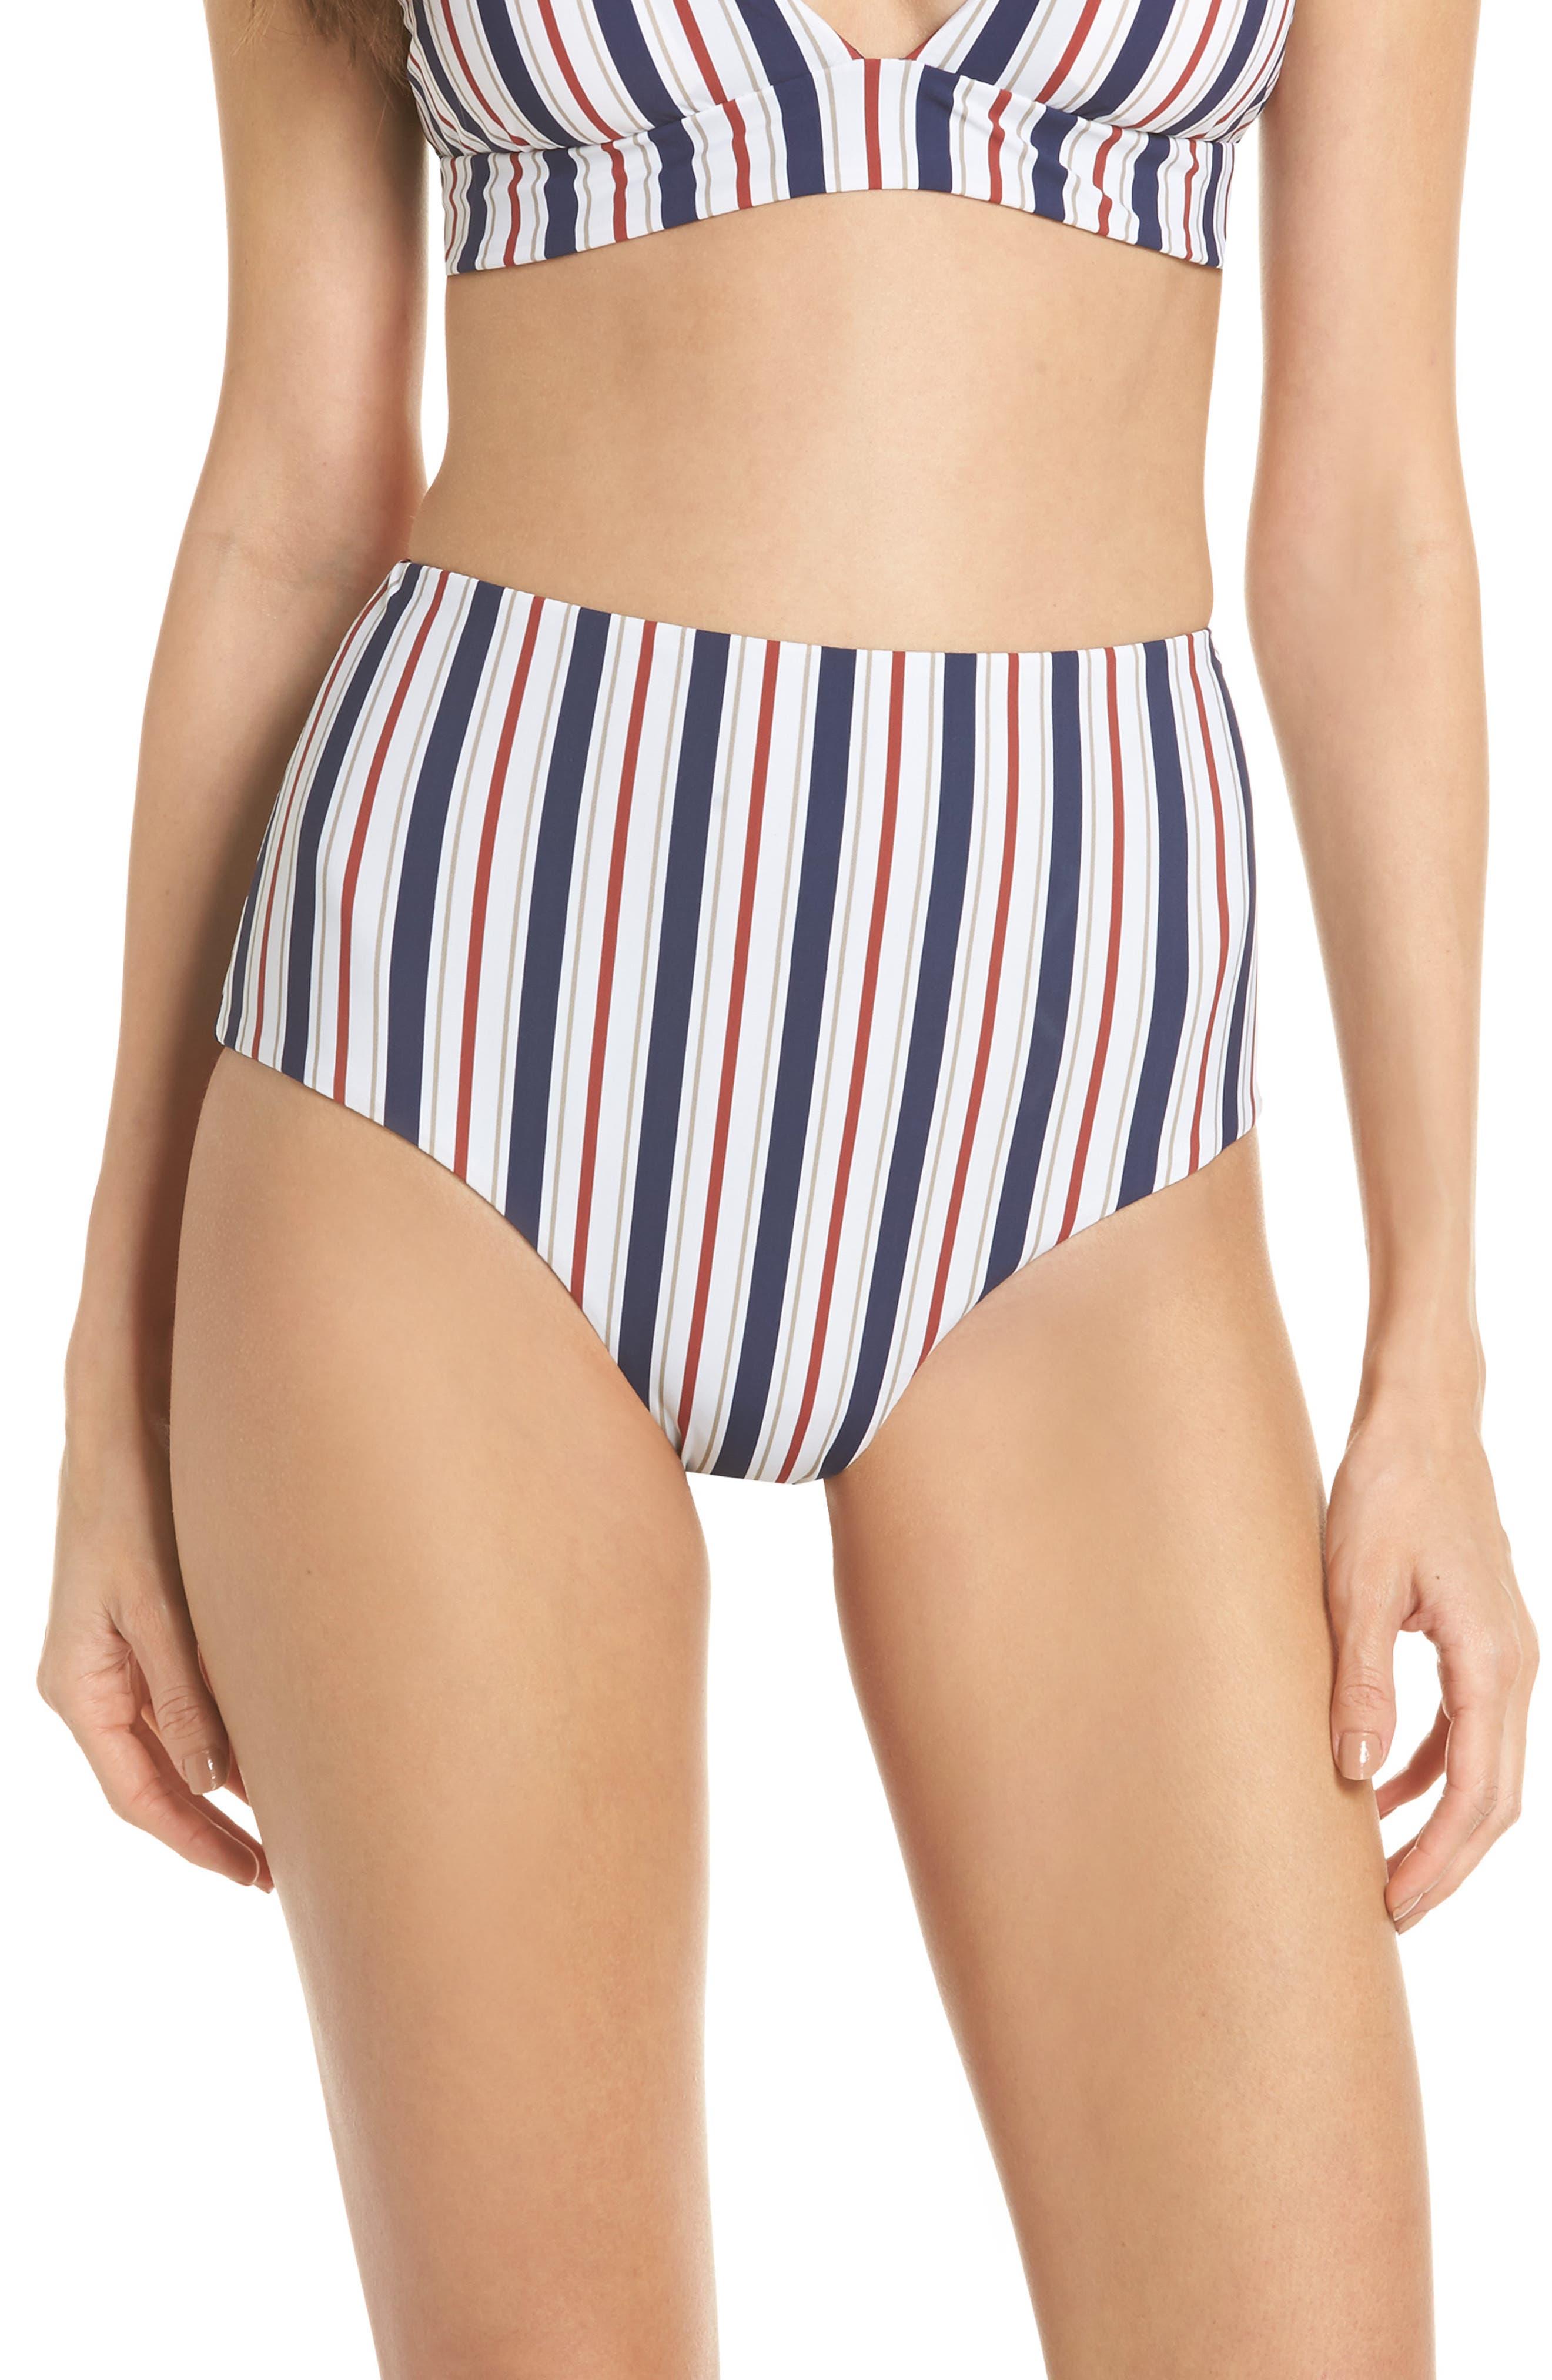 Better Than Ever High Waist Bikini Bottoms,                         Main,                         color, 960